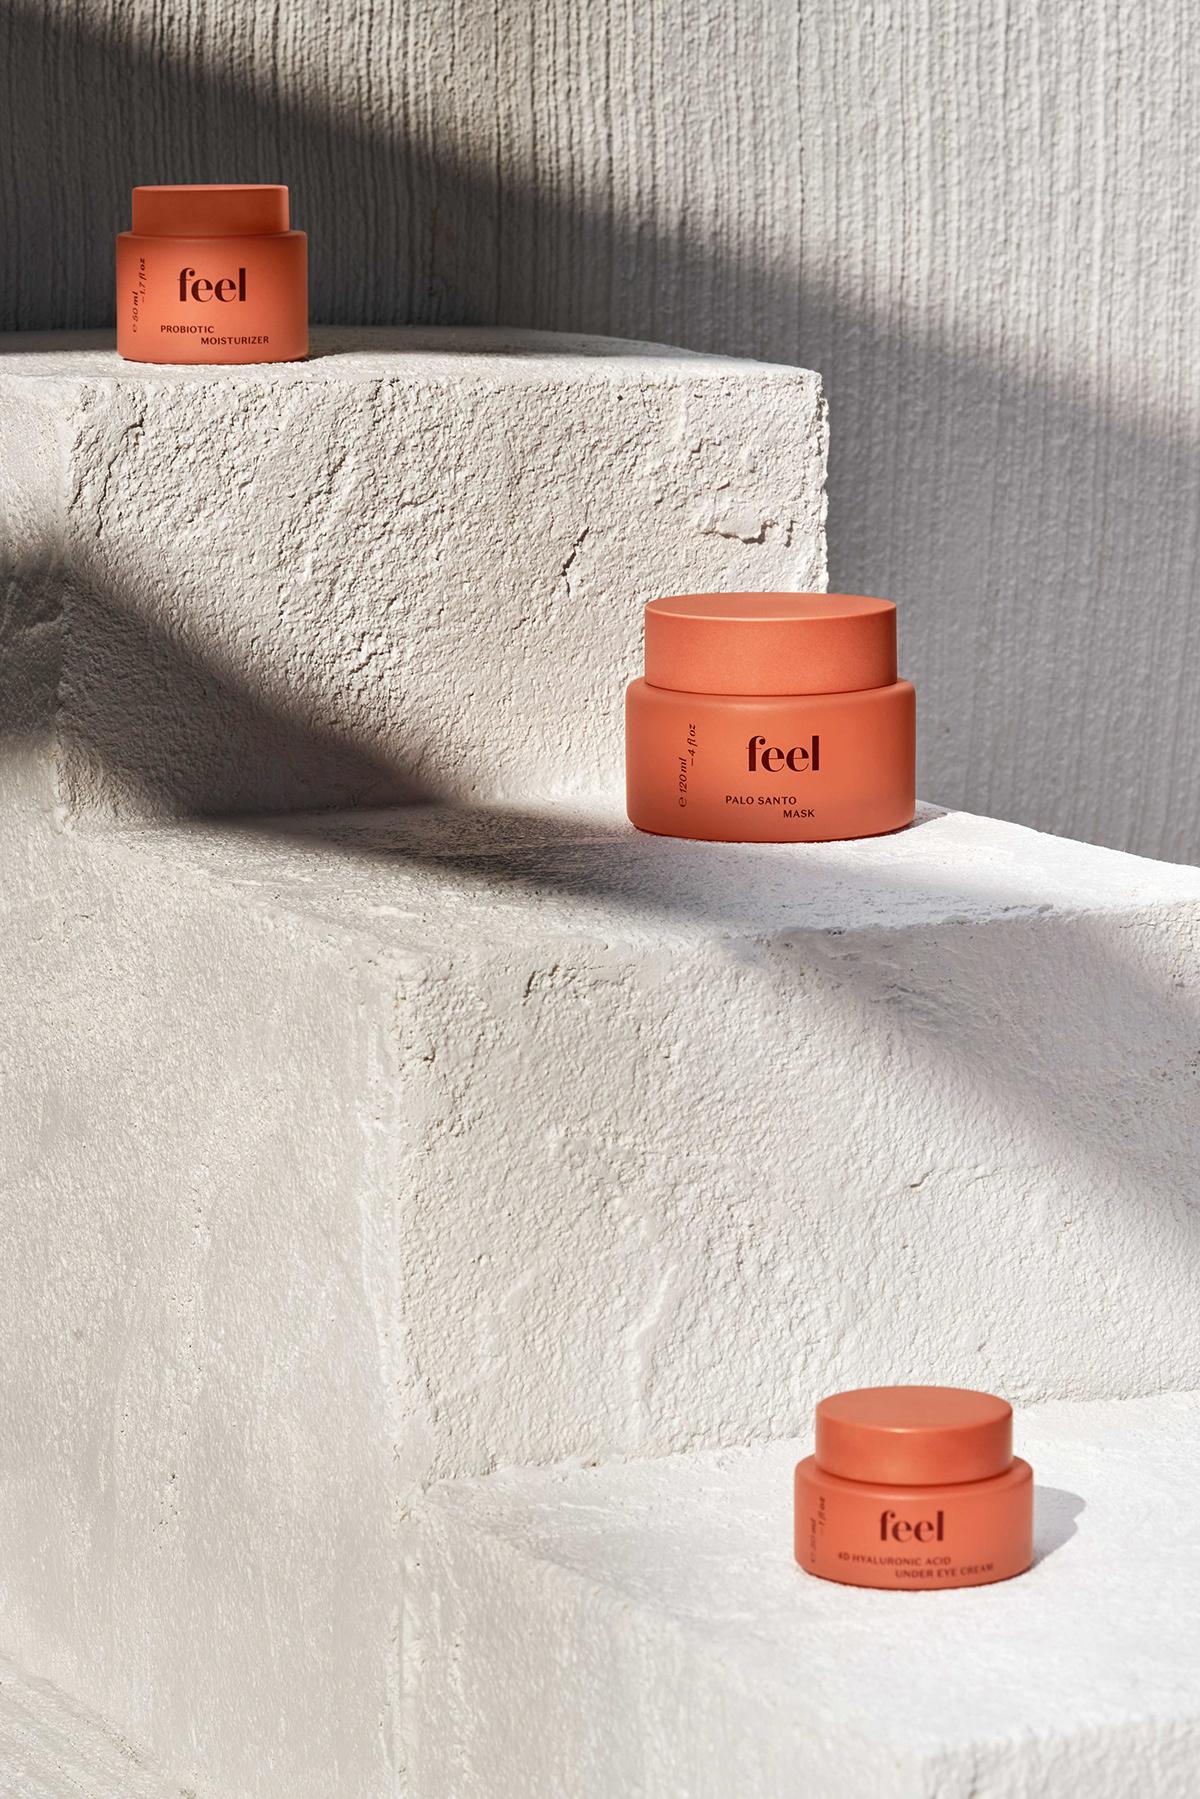 Feel Skincare brand packaging design and branding for sustainability